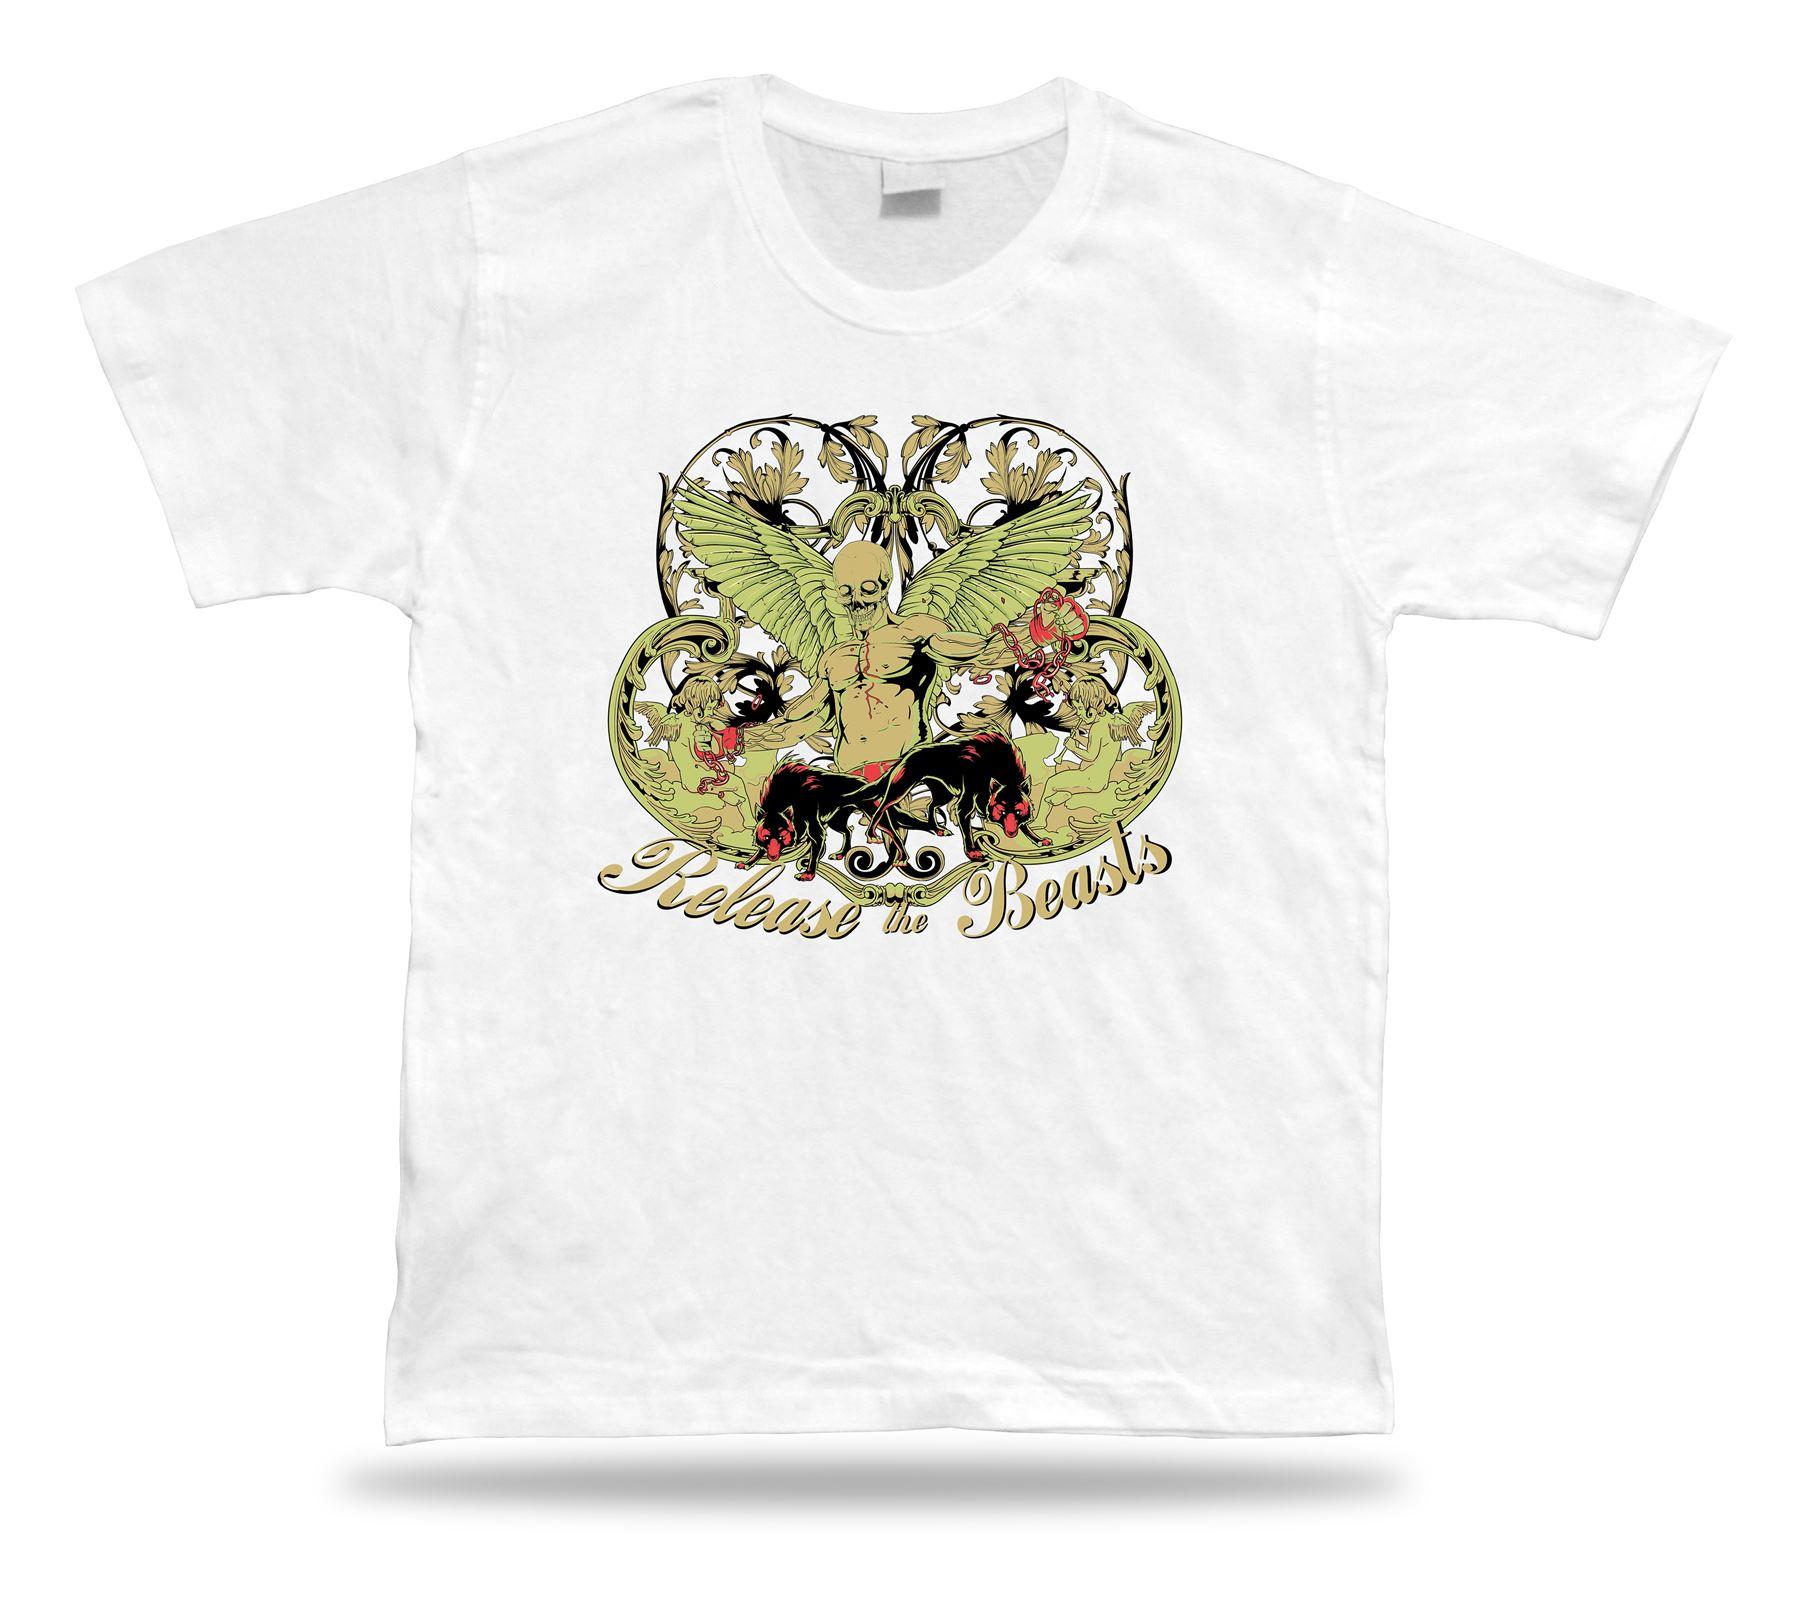 Tshirt Tee Shirt Birthday Gift Idea Release The Beasts Evil Angel ... d94f20e63